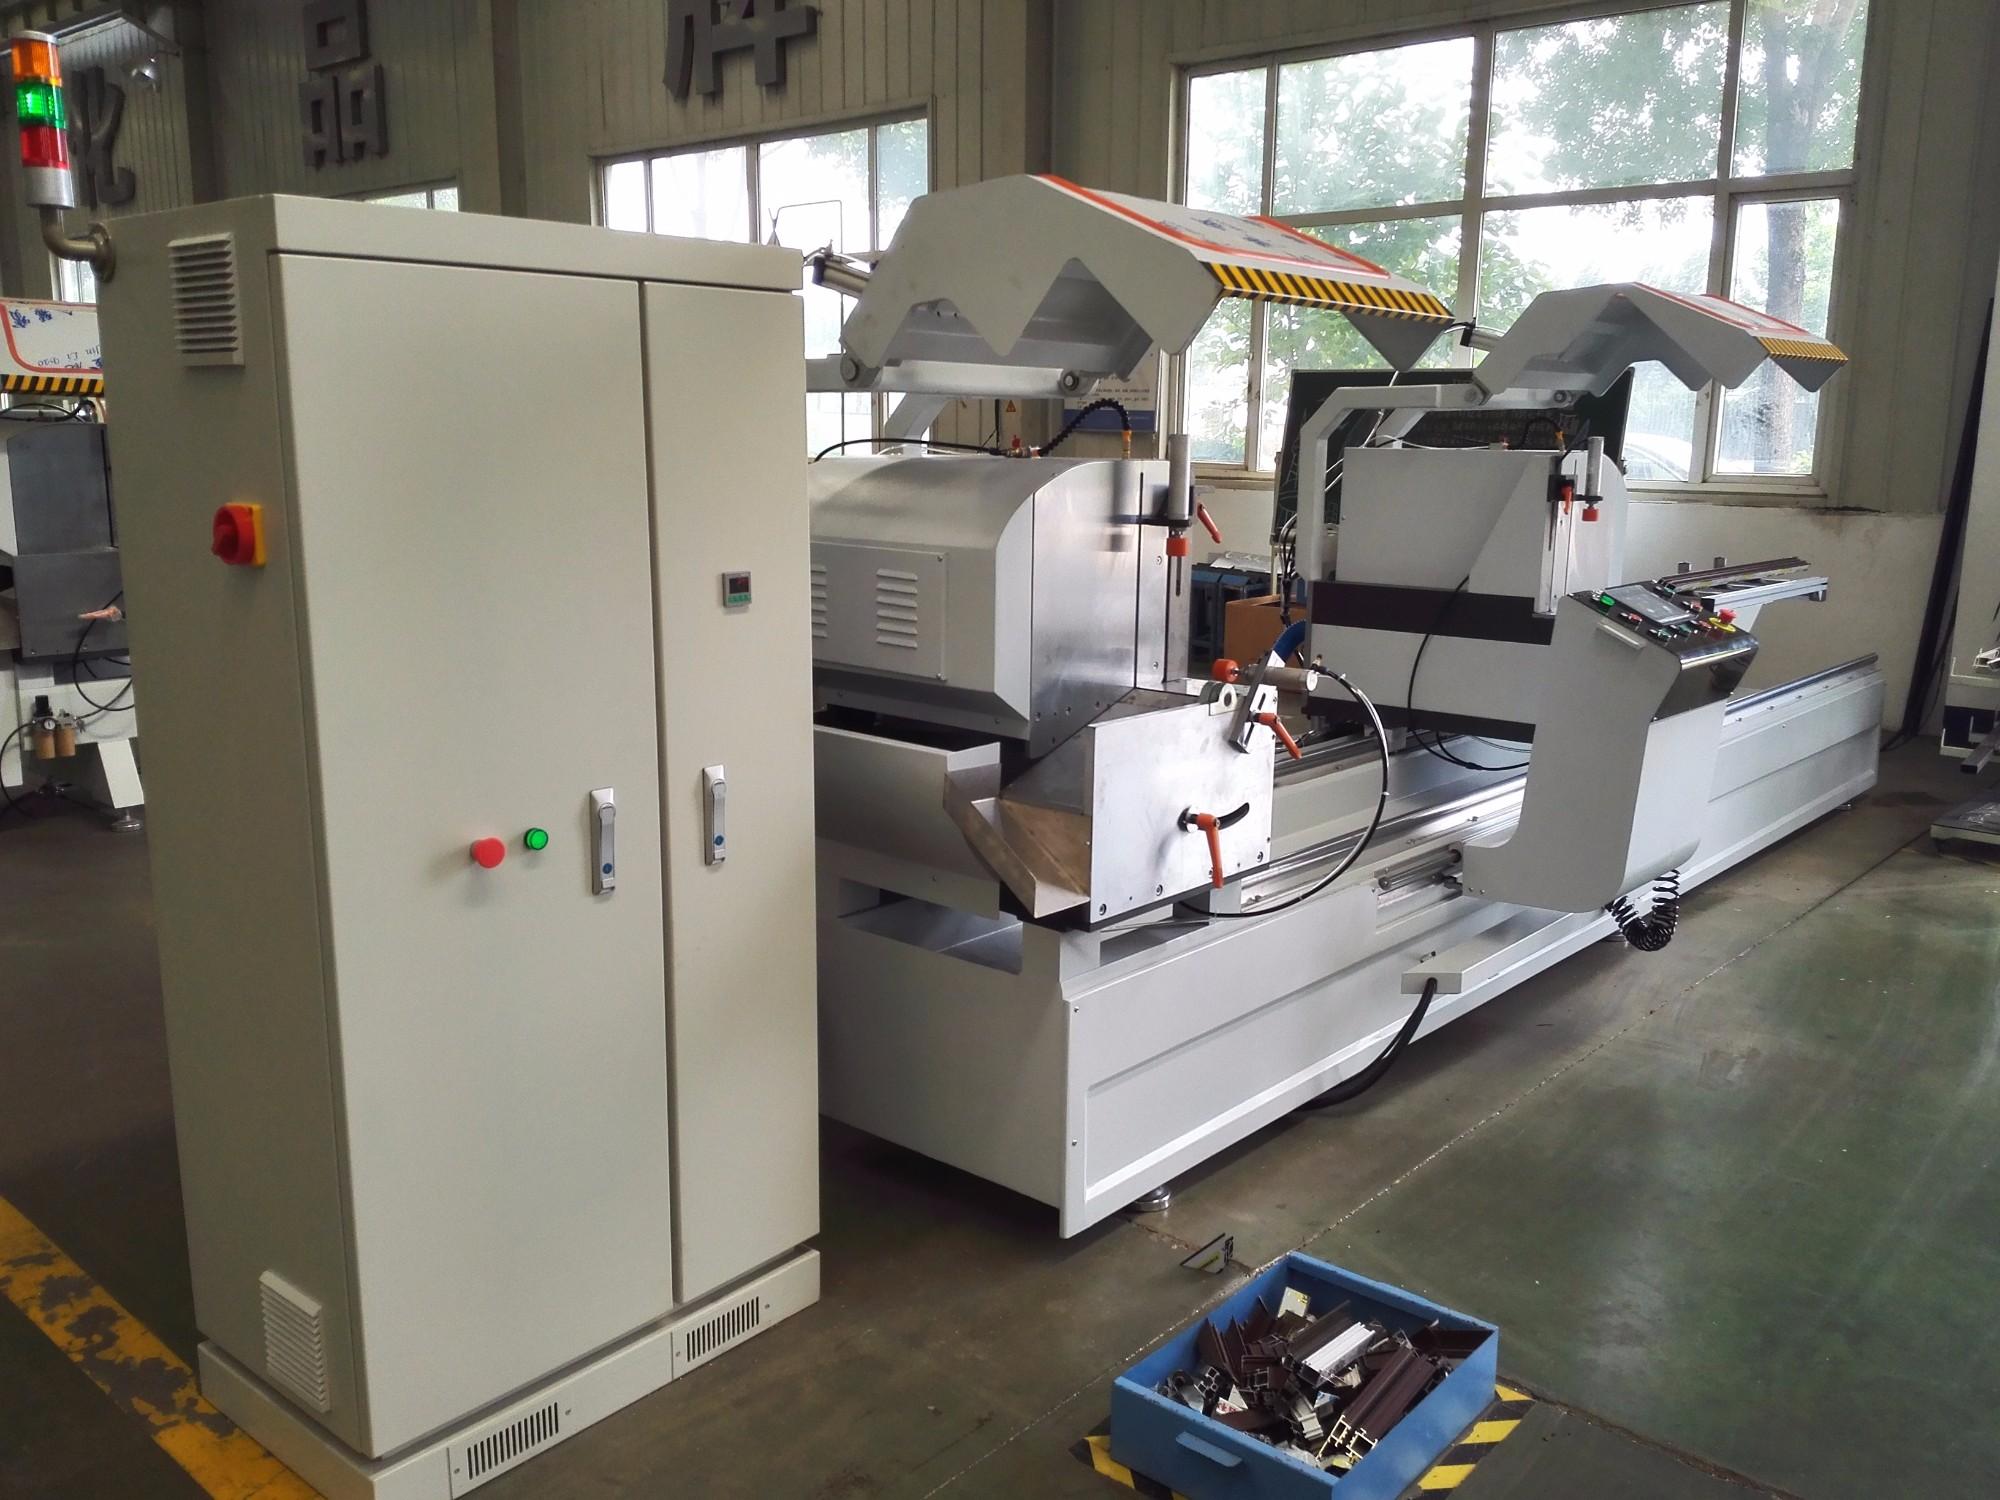 High quality PVC CNC Double Head Cutting Saw Quotes,China PVC CNC Double Head Cutting Saw Factory,PVC CNC Double Head Cutting Saw Purchasing